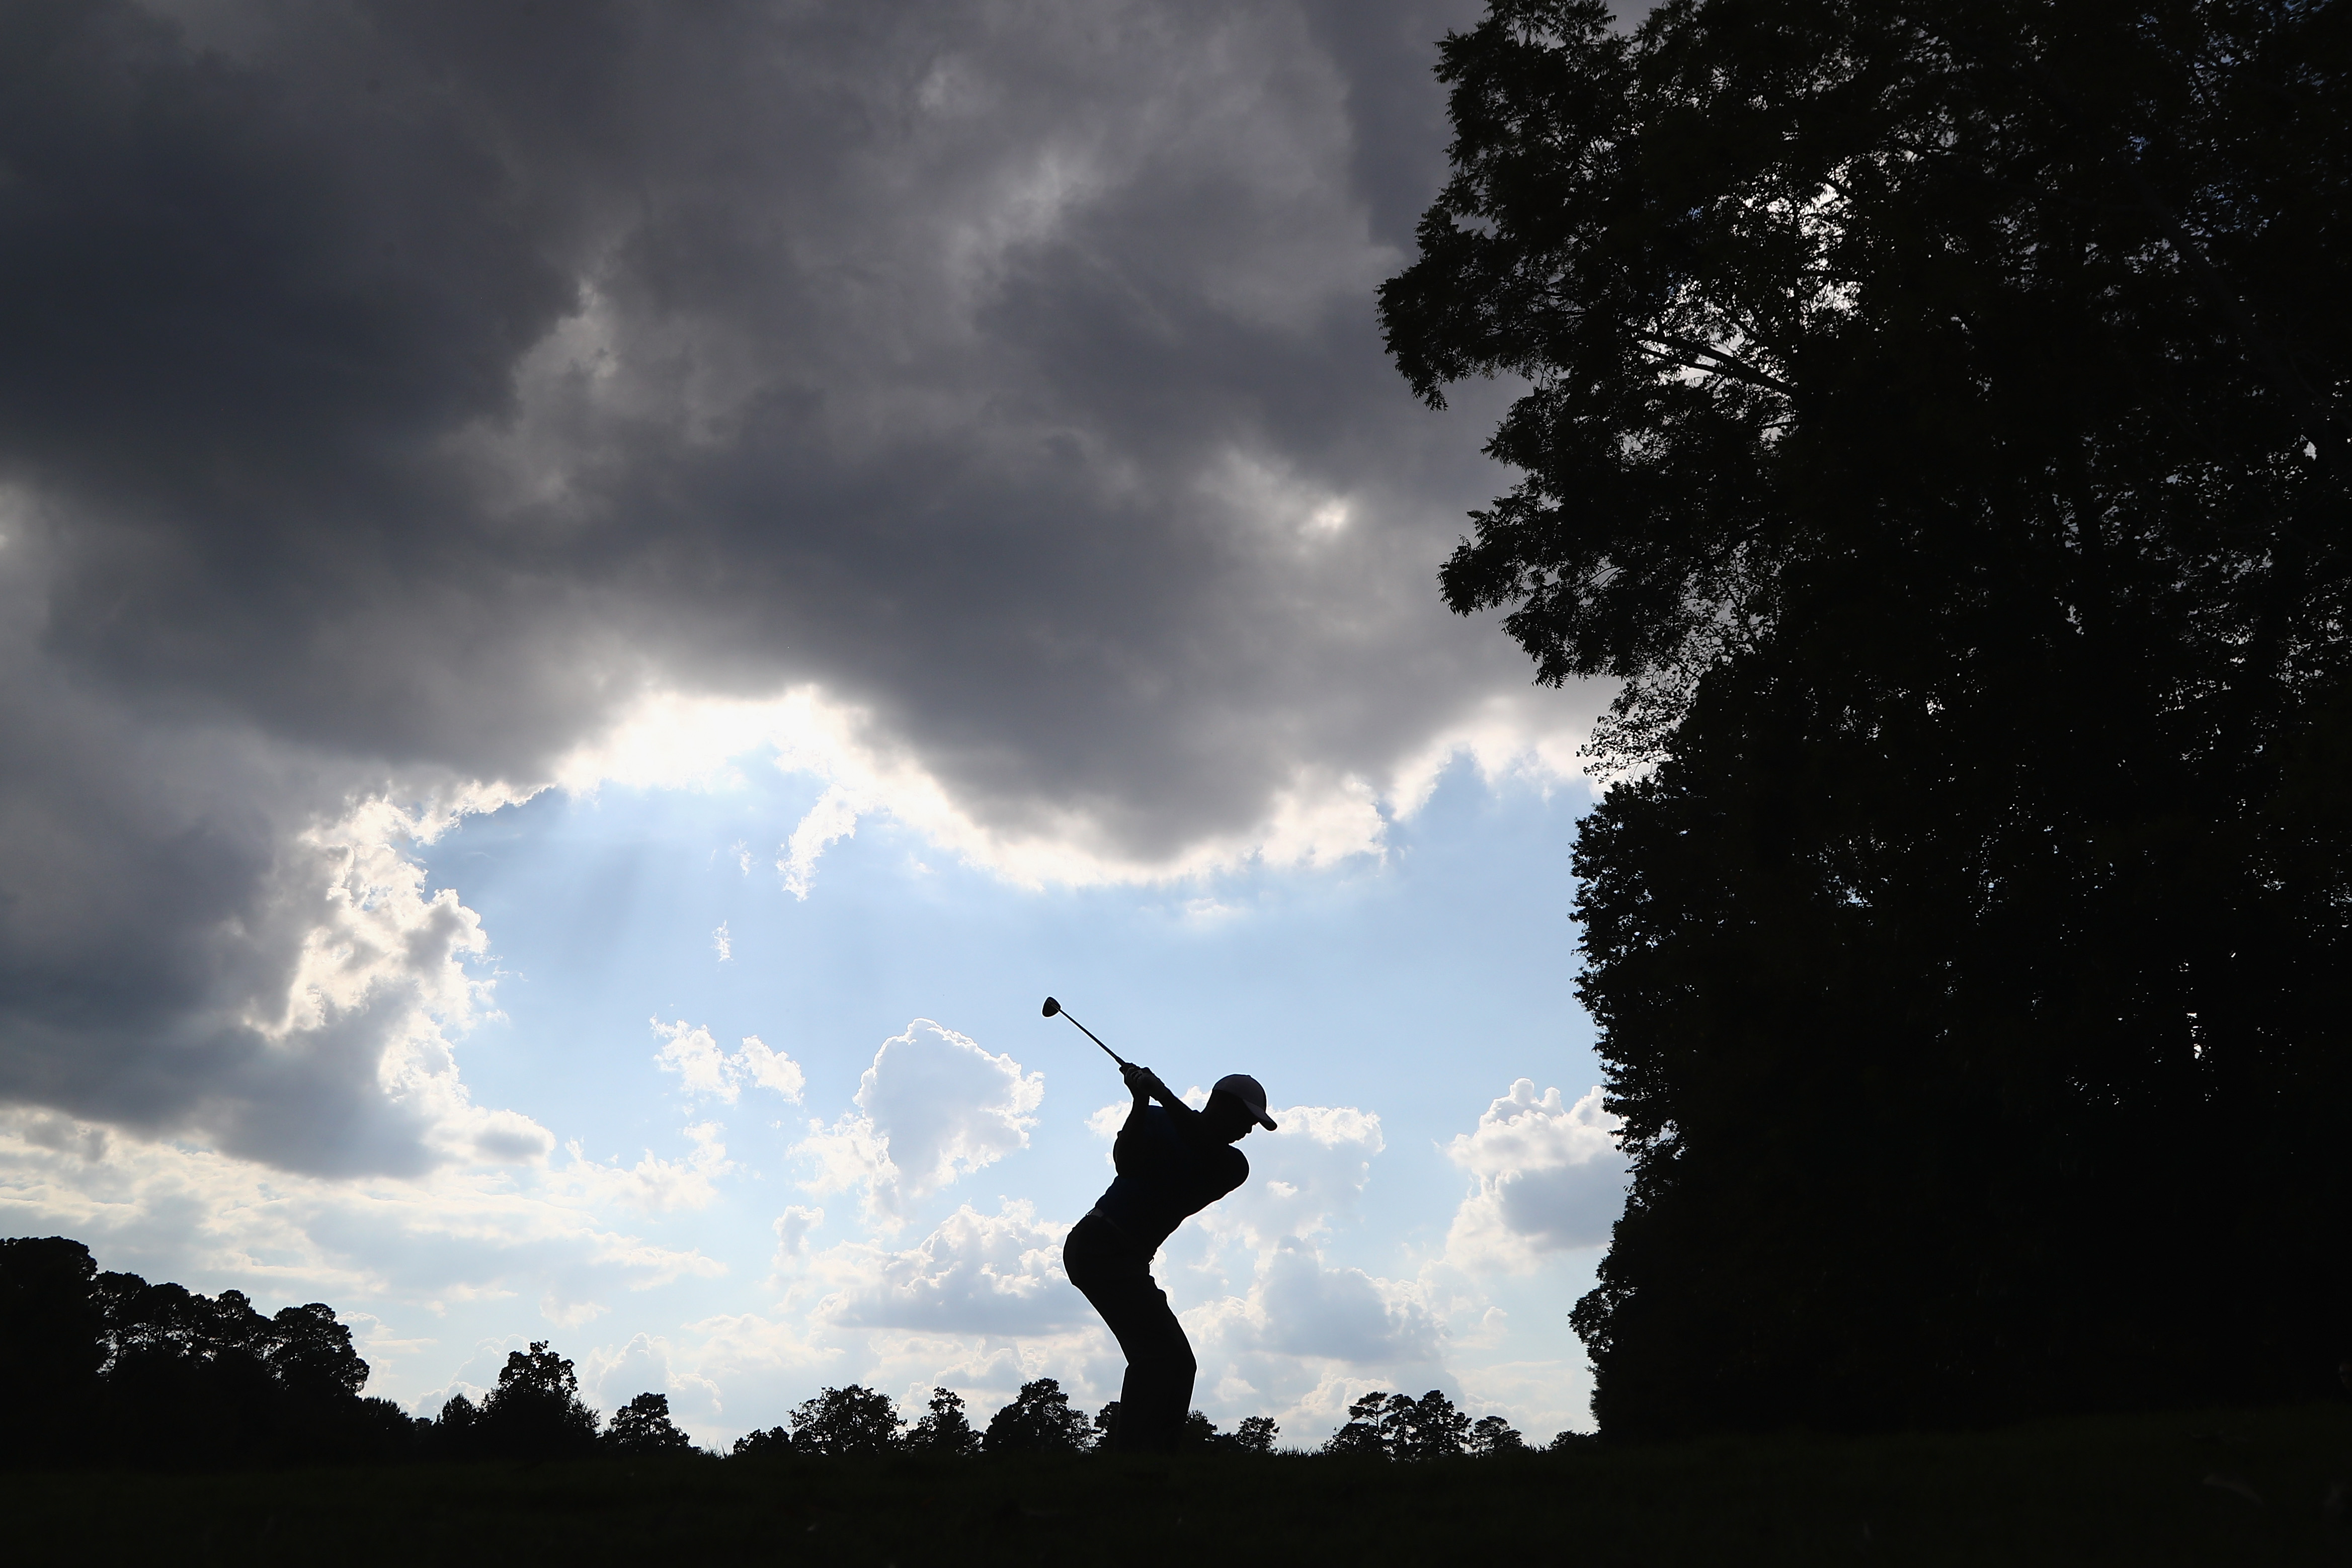 A photo of golf superstar Tiger Woods teeing off beneath an ominous dark cloud.